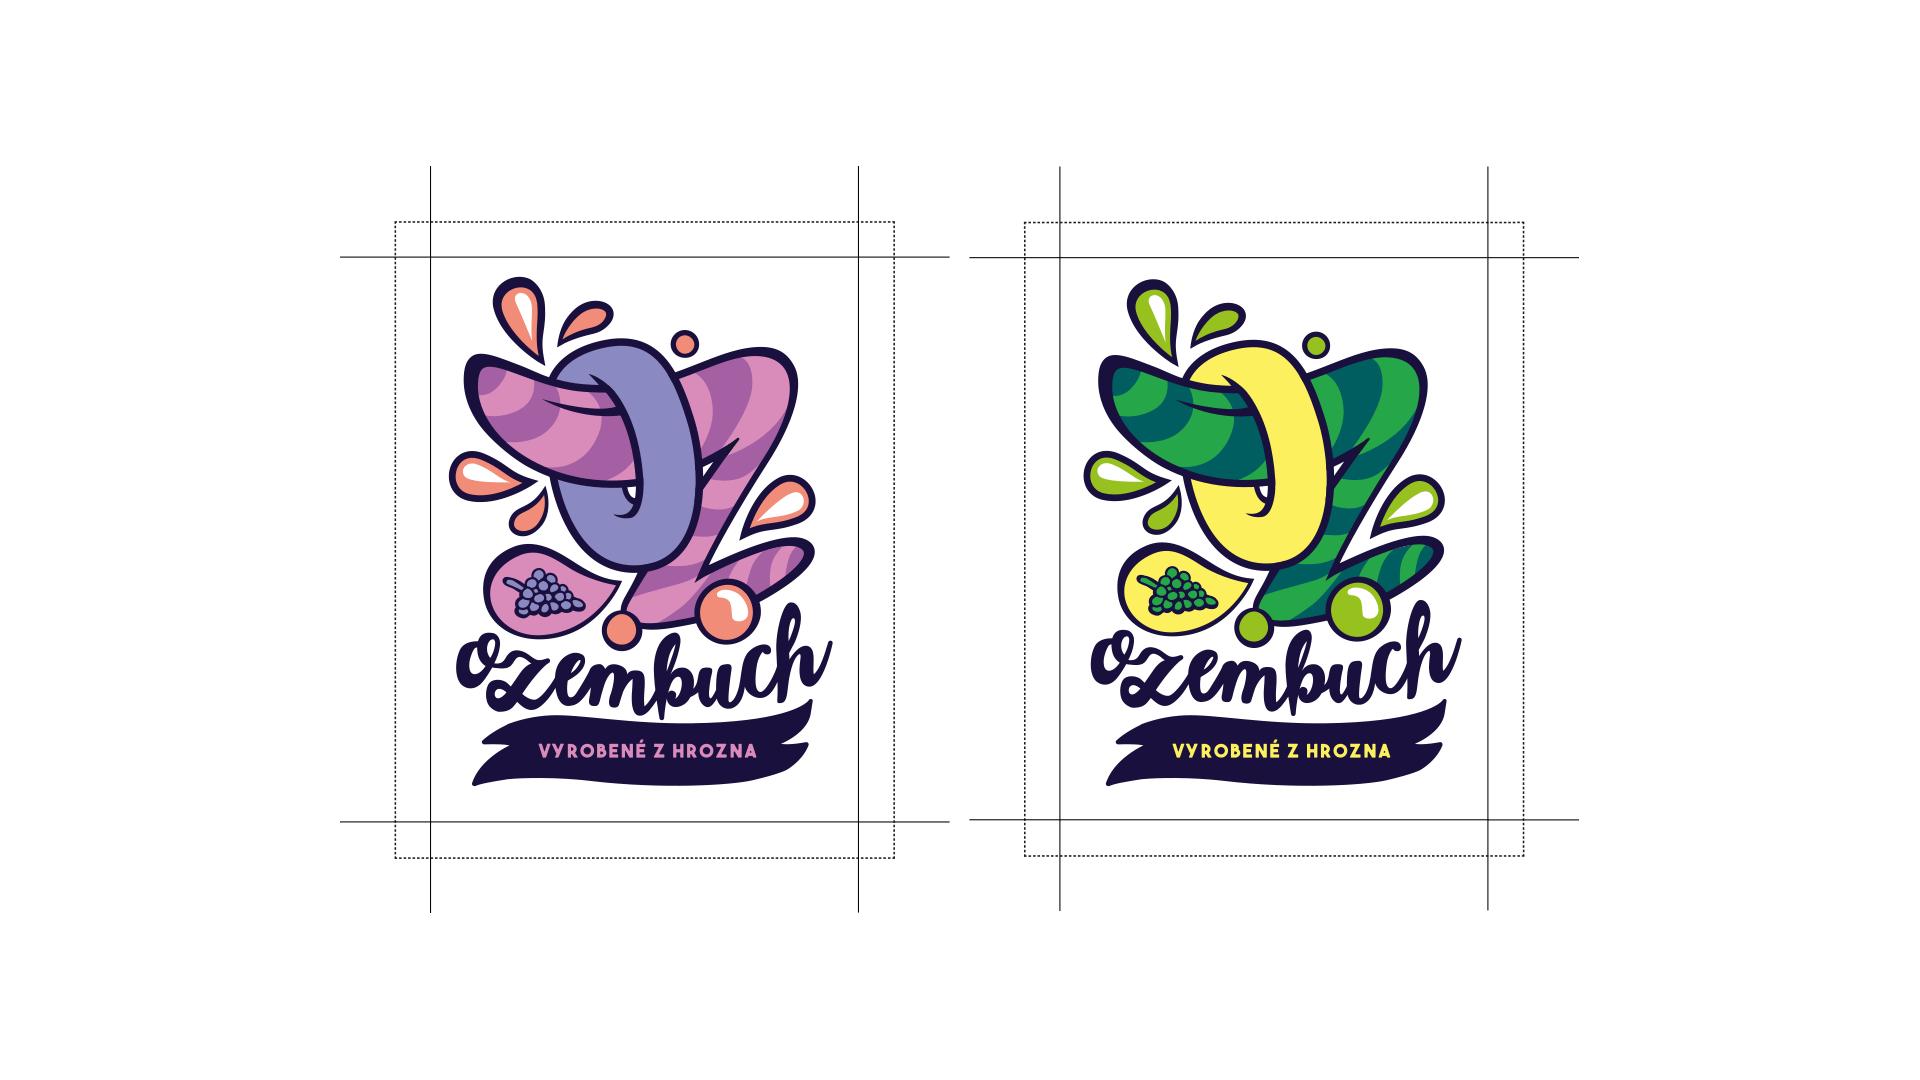 Ozembuch